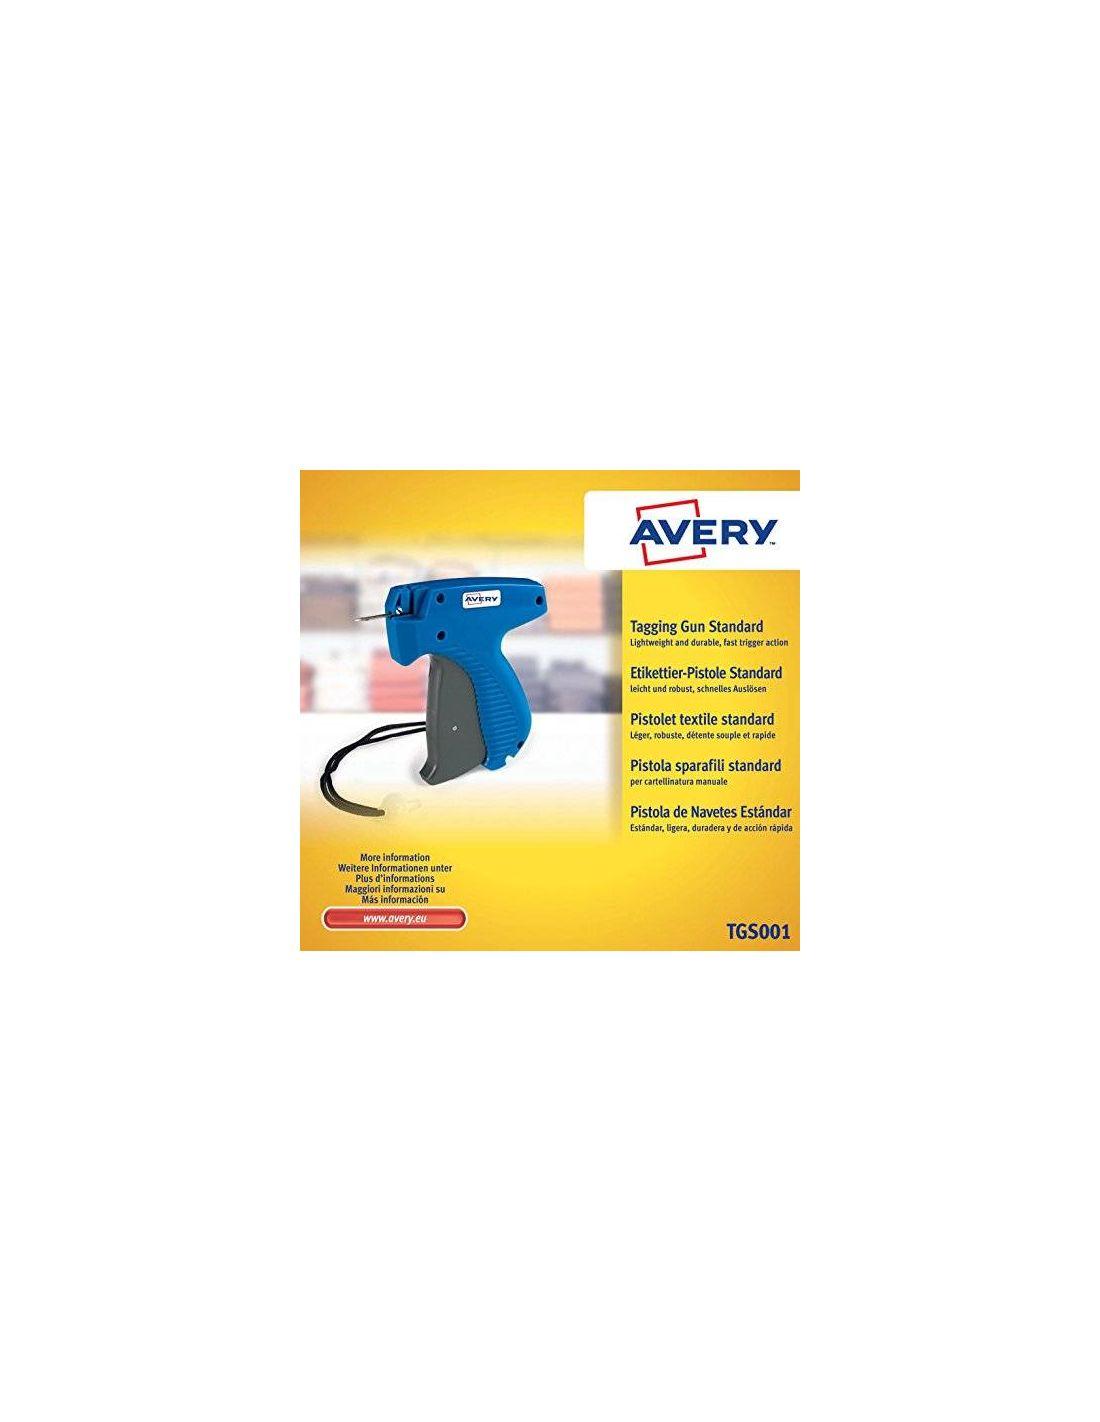 Avery TGS001 Pistola Sparafili per Cartellinatura Manuale